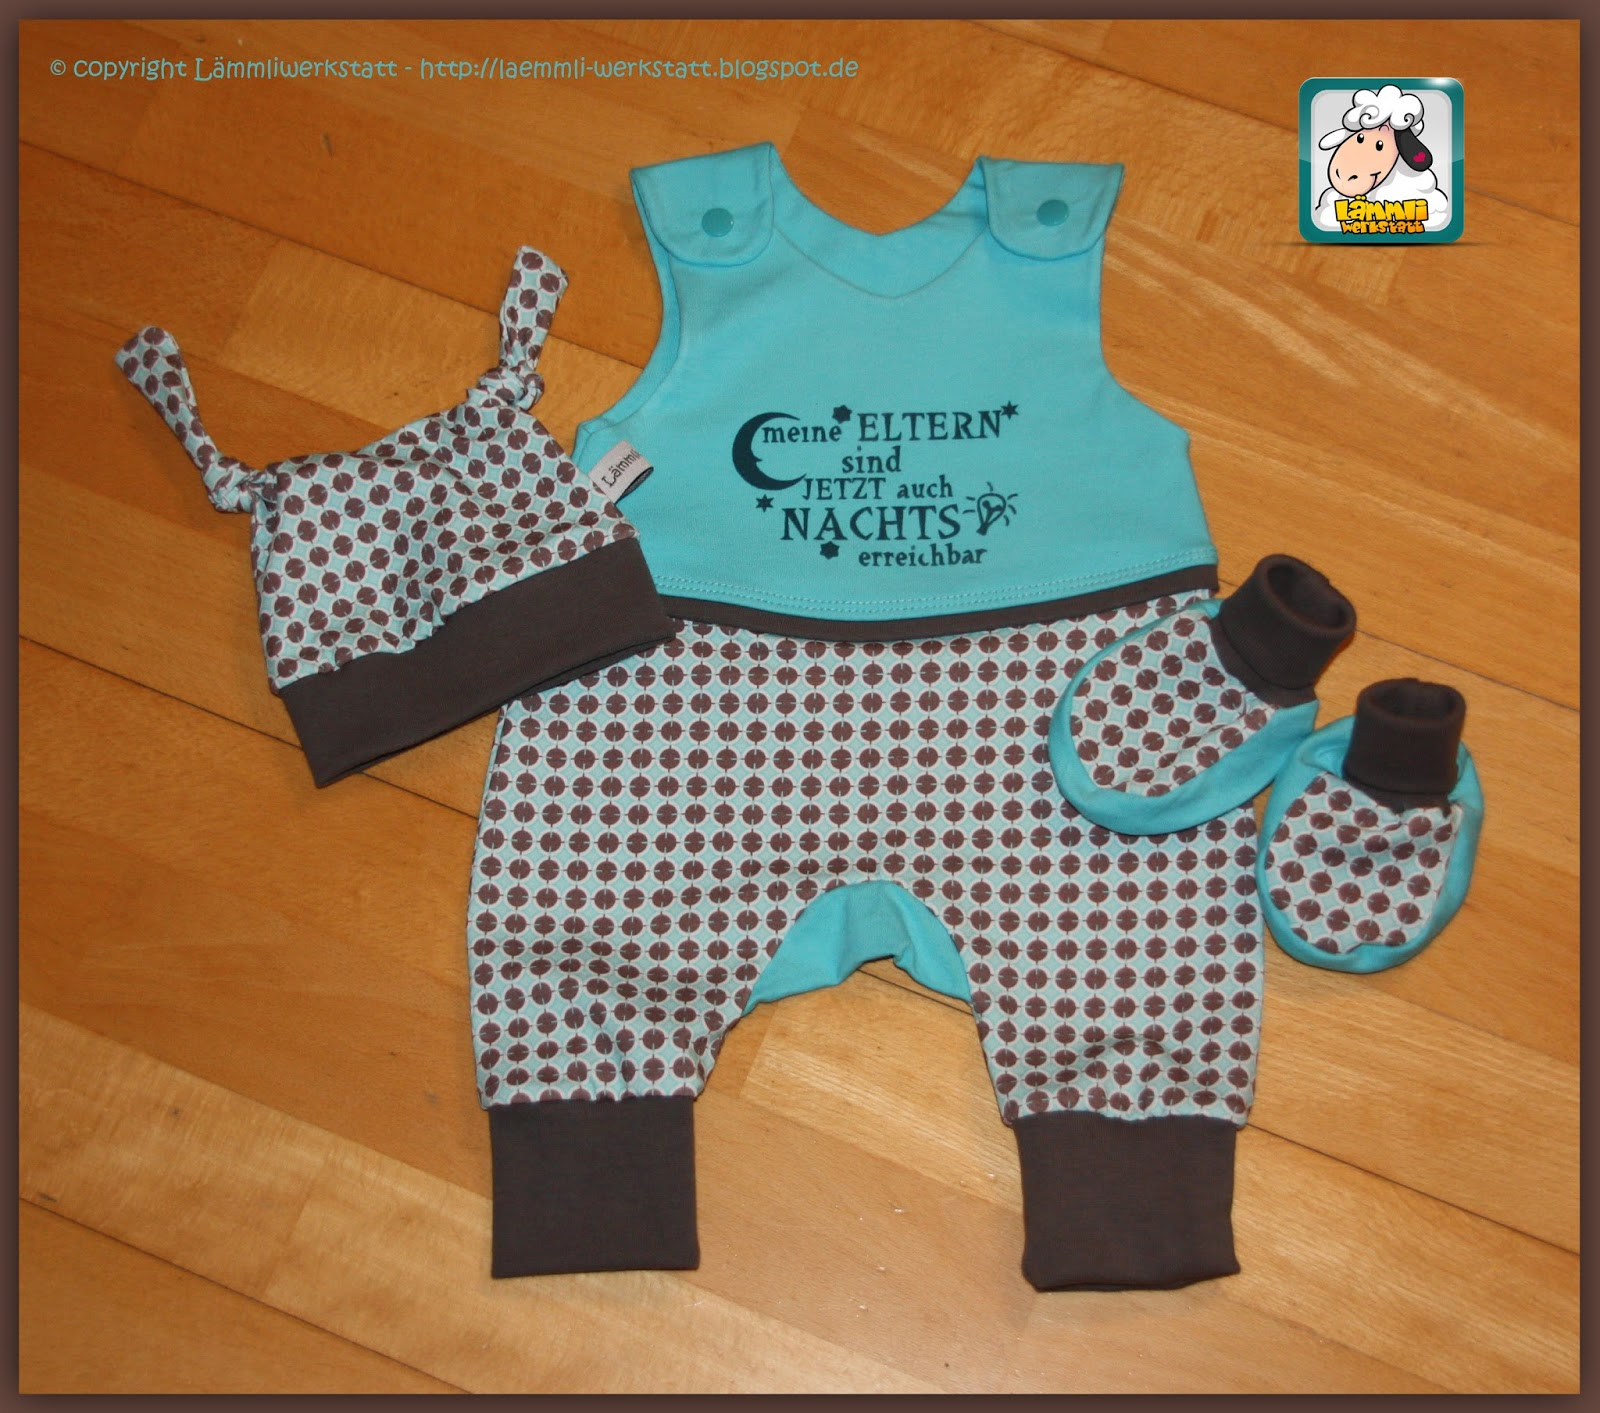 gallerphot baby strampler mit lustigen spr chen. Black Bedroom Furniture Sets. Home Design Ideas